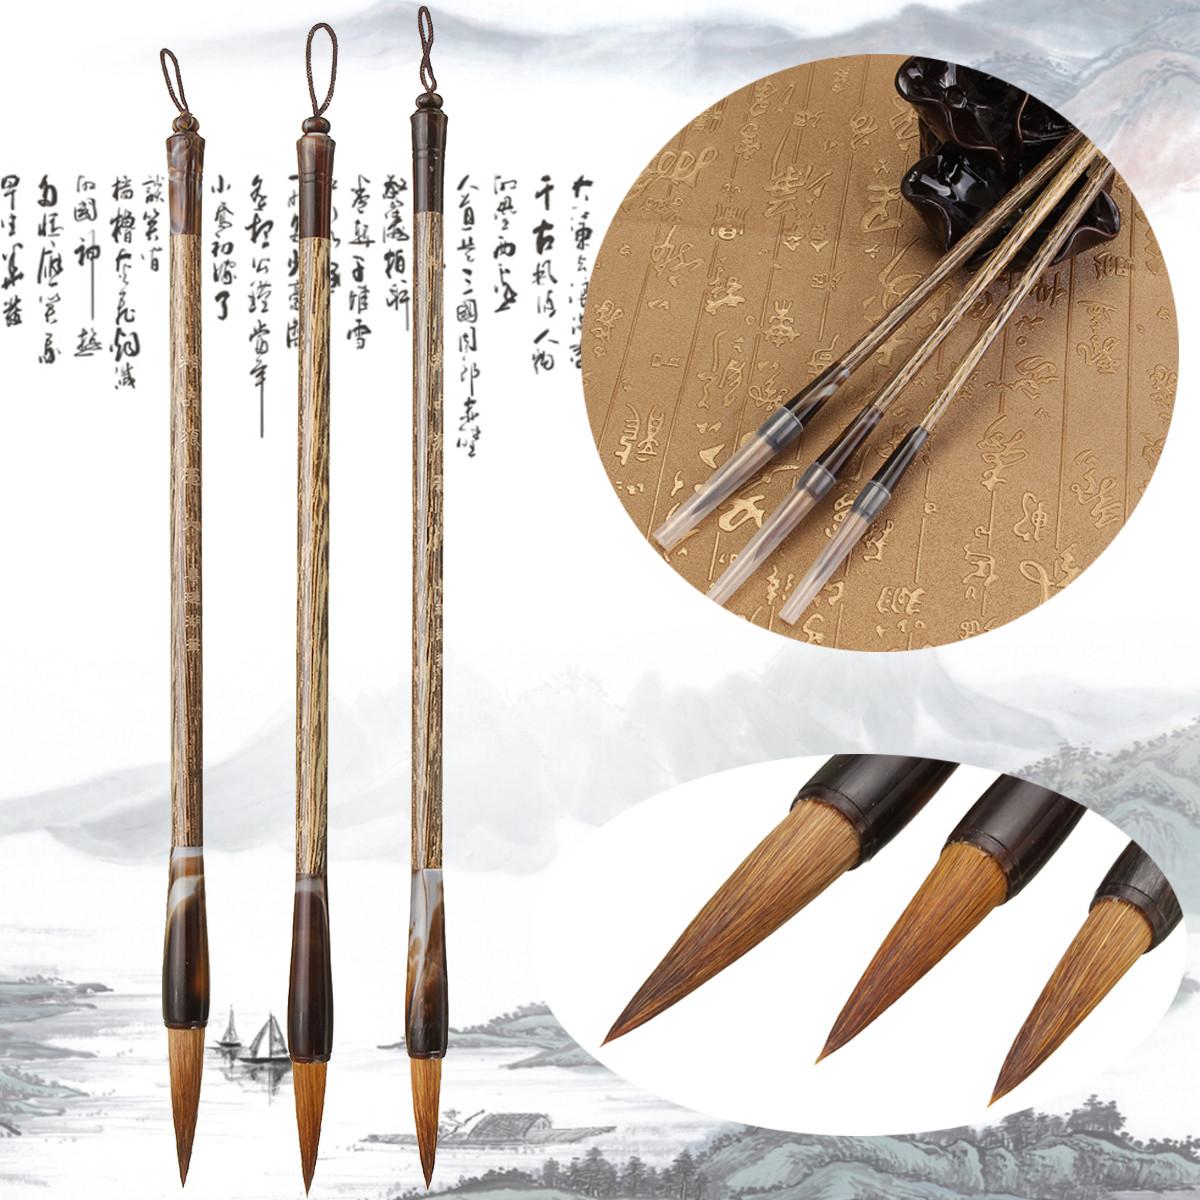 3 Size Chinese Writing Brush Calligraphy Pen Painting Art